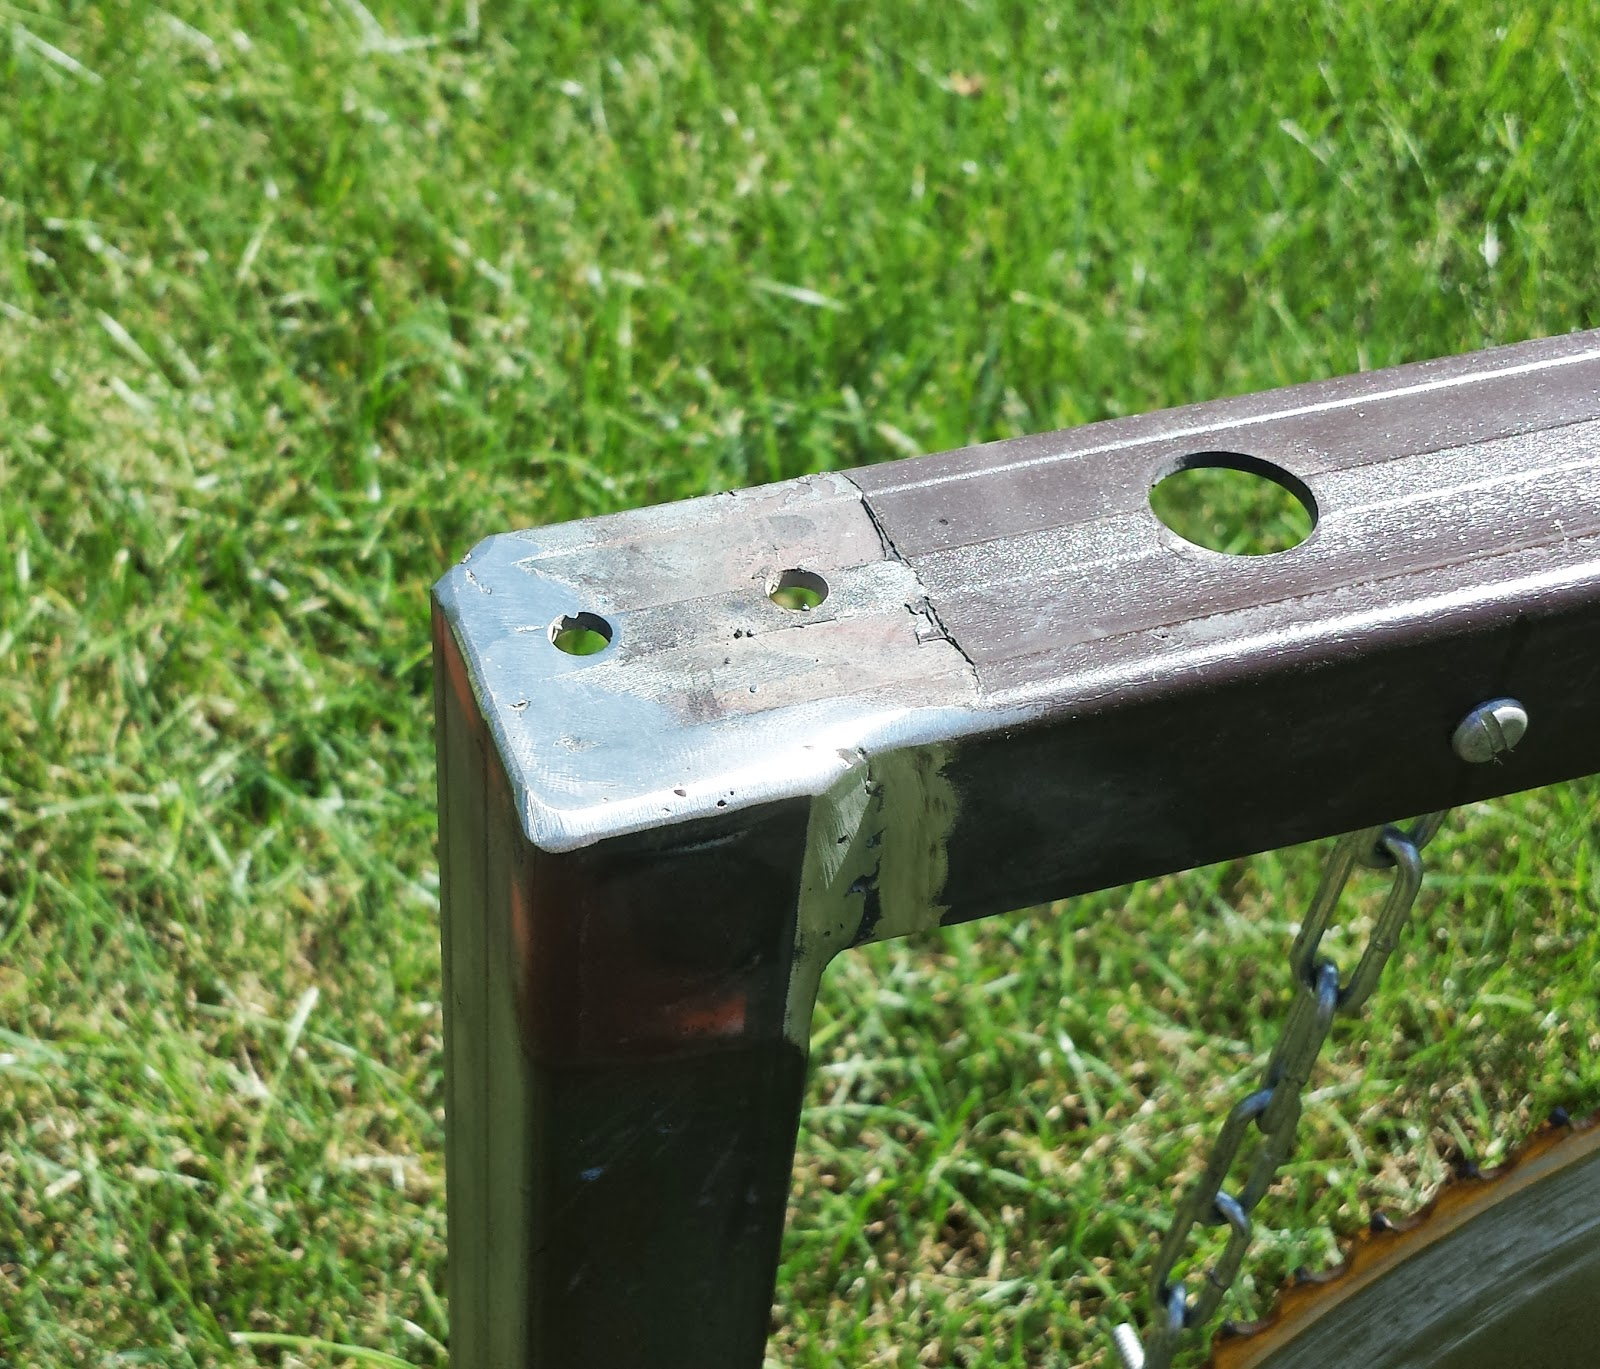 how to mount cut off blade to die grinder